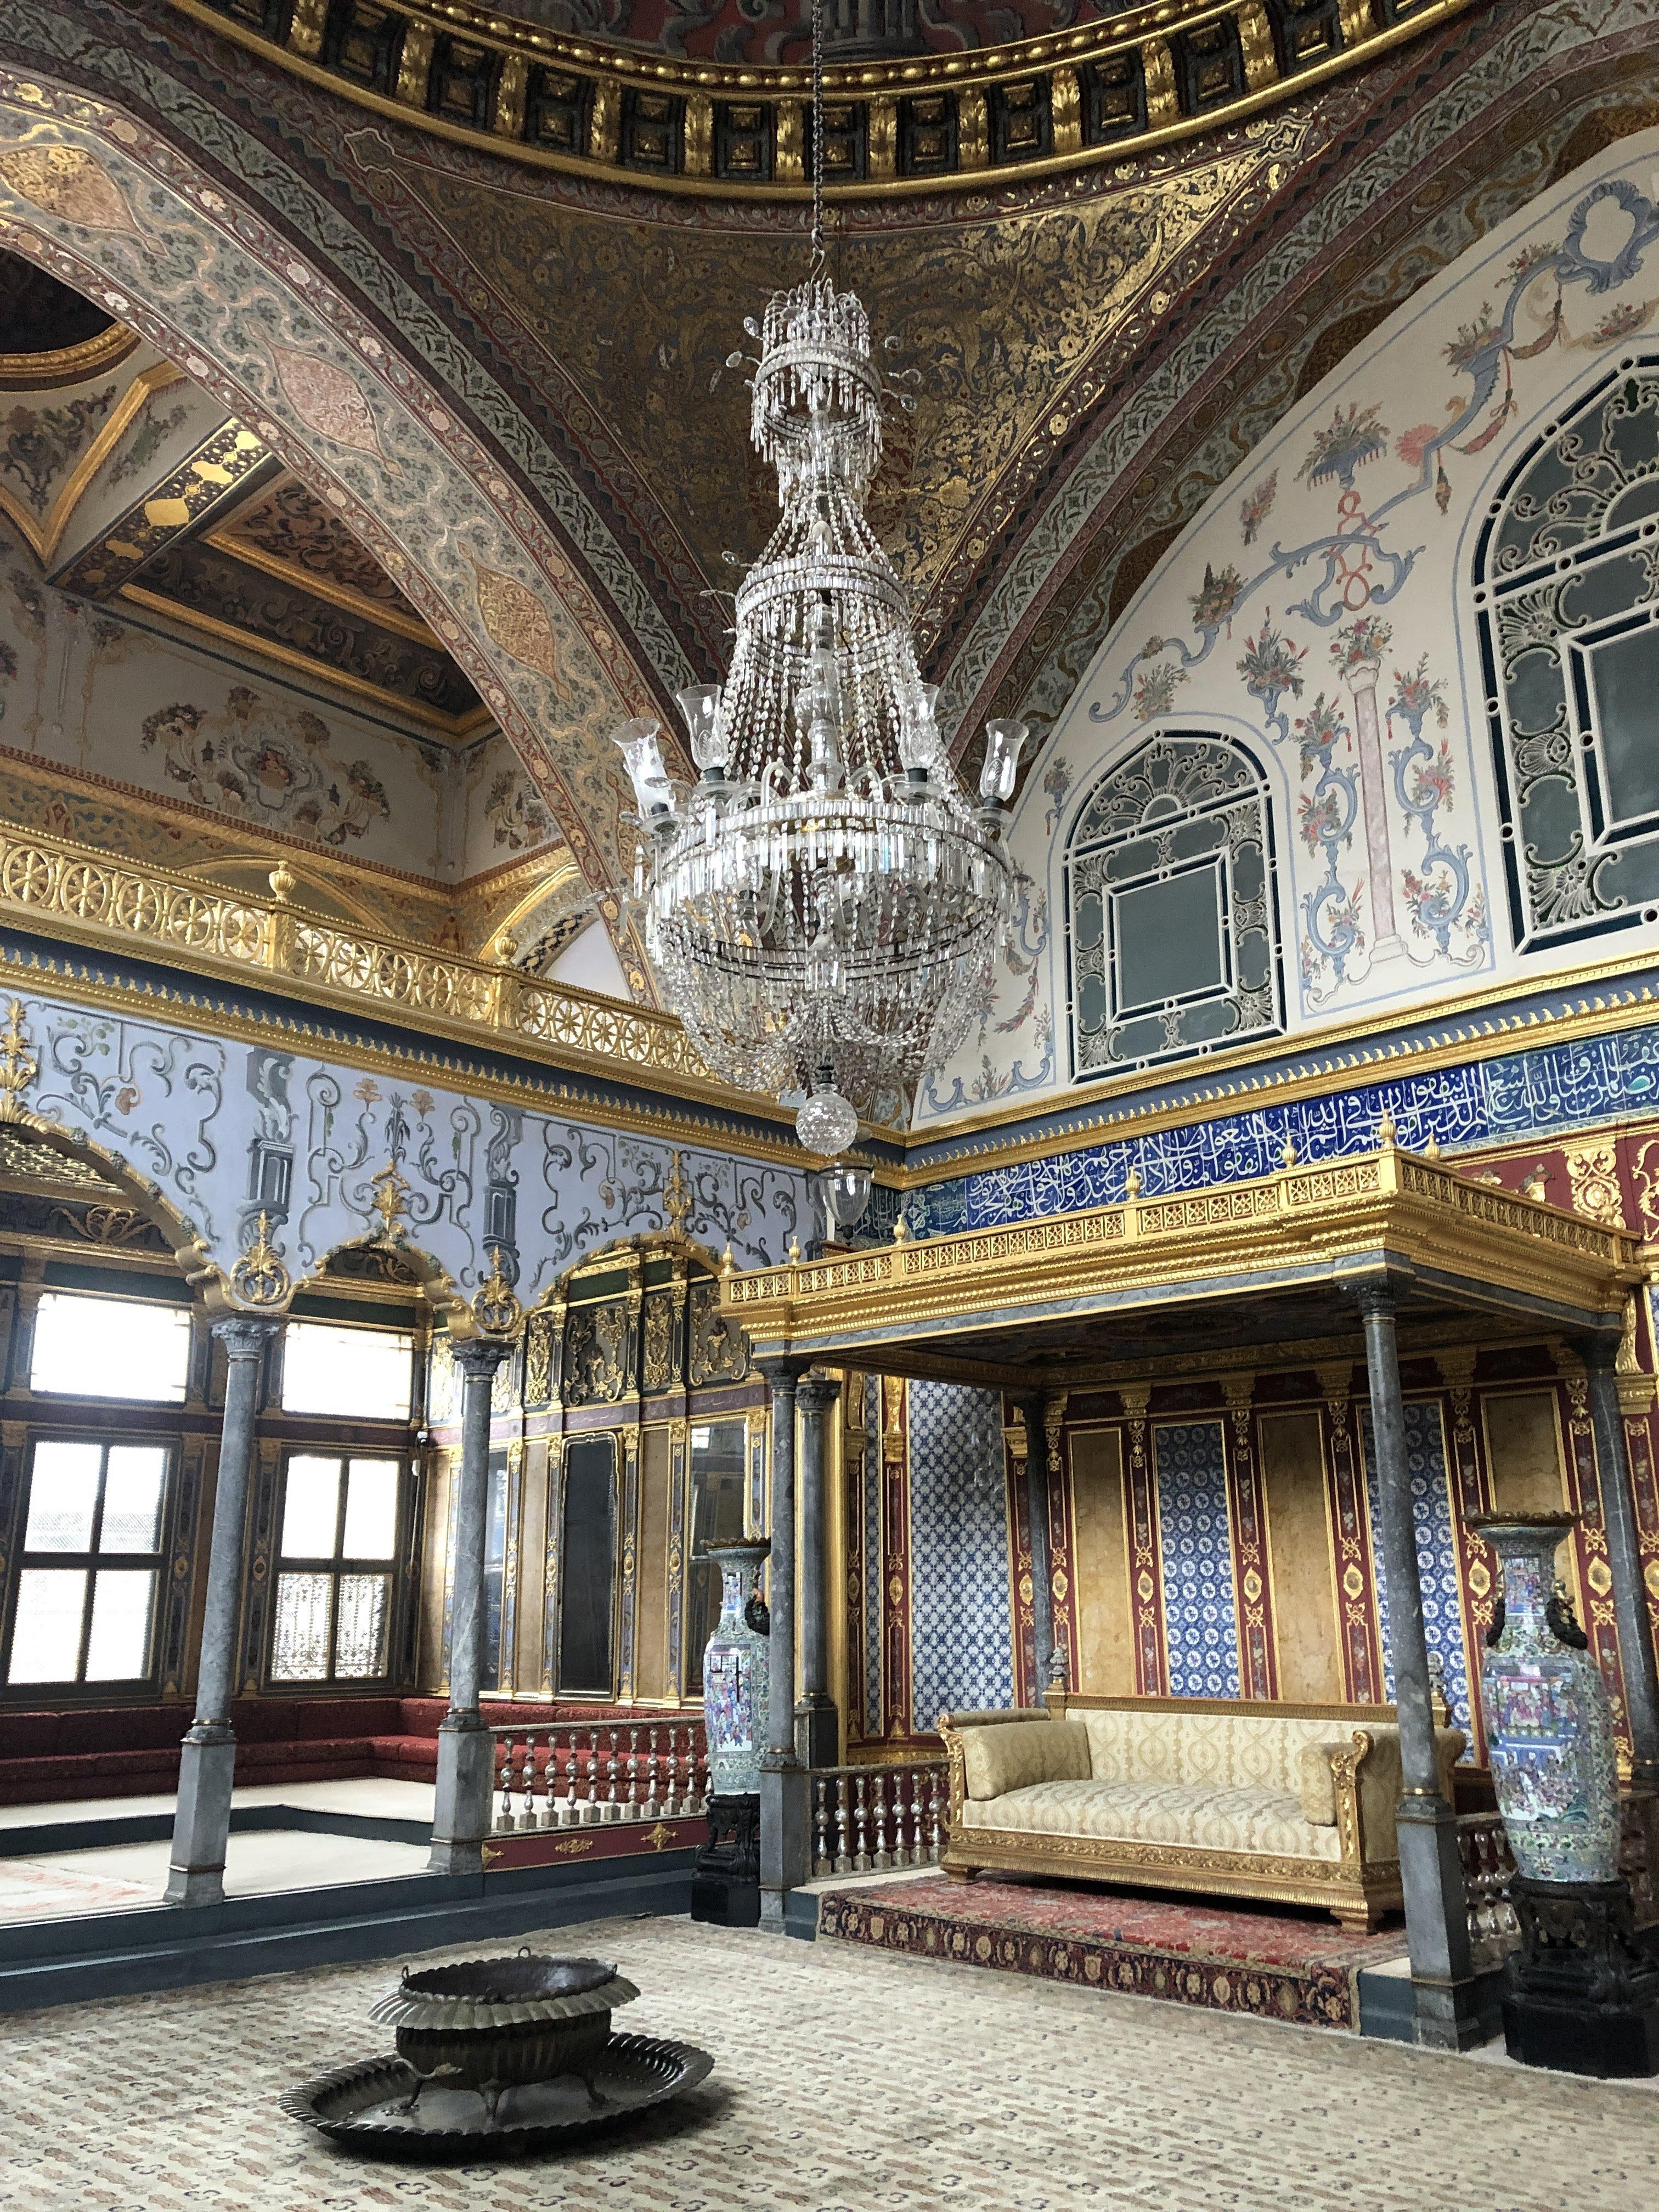 Harem at Topkapi Palace in Istanbul